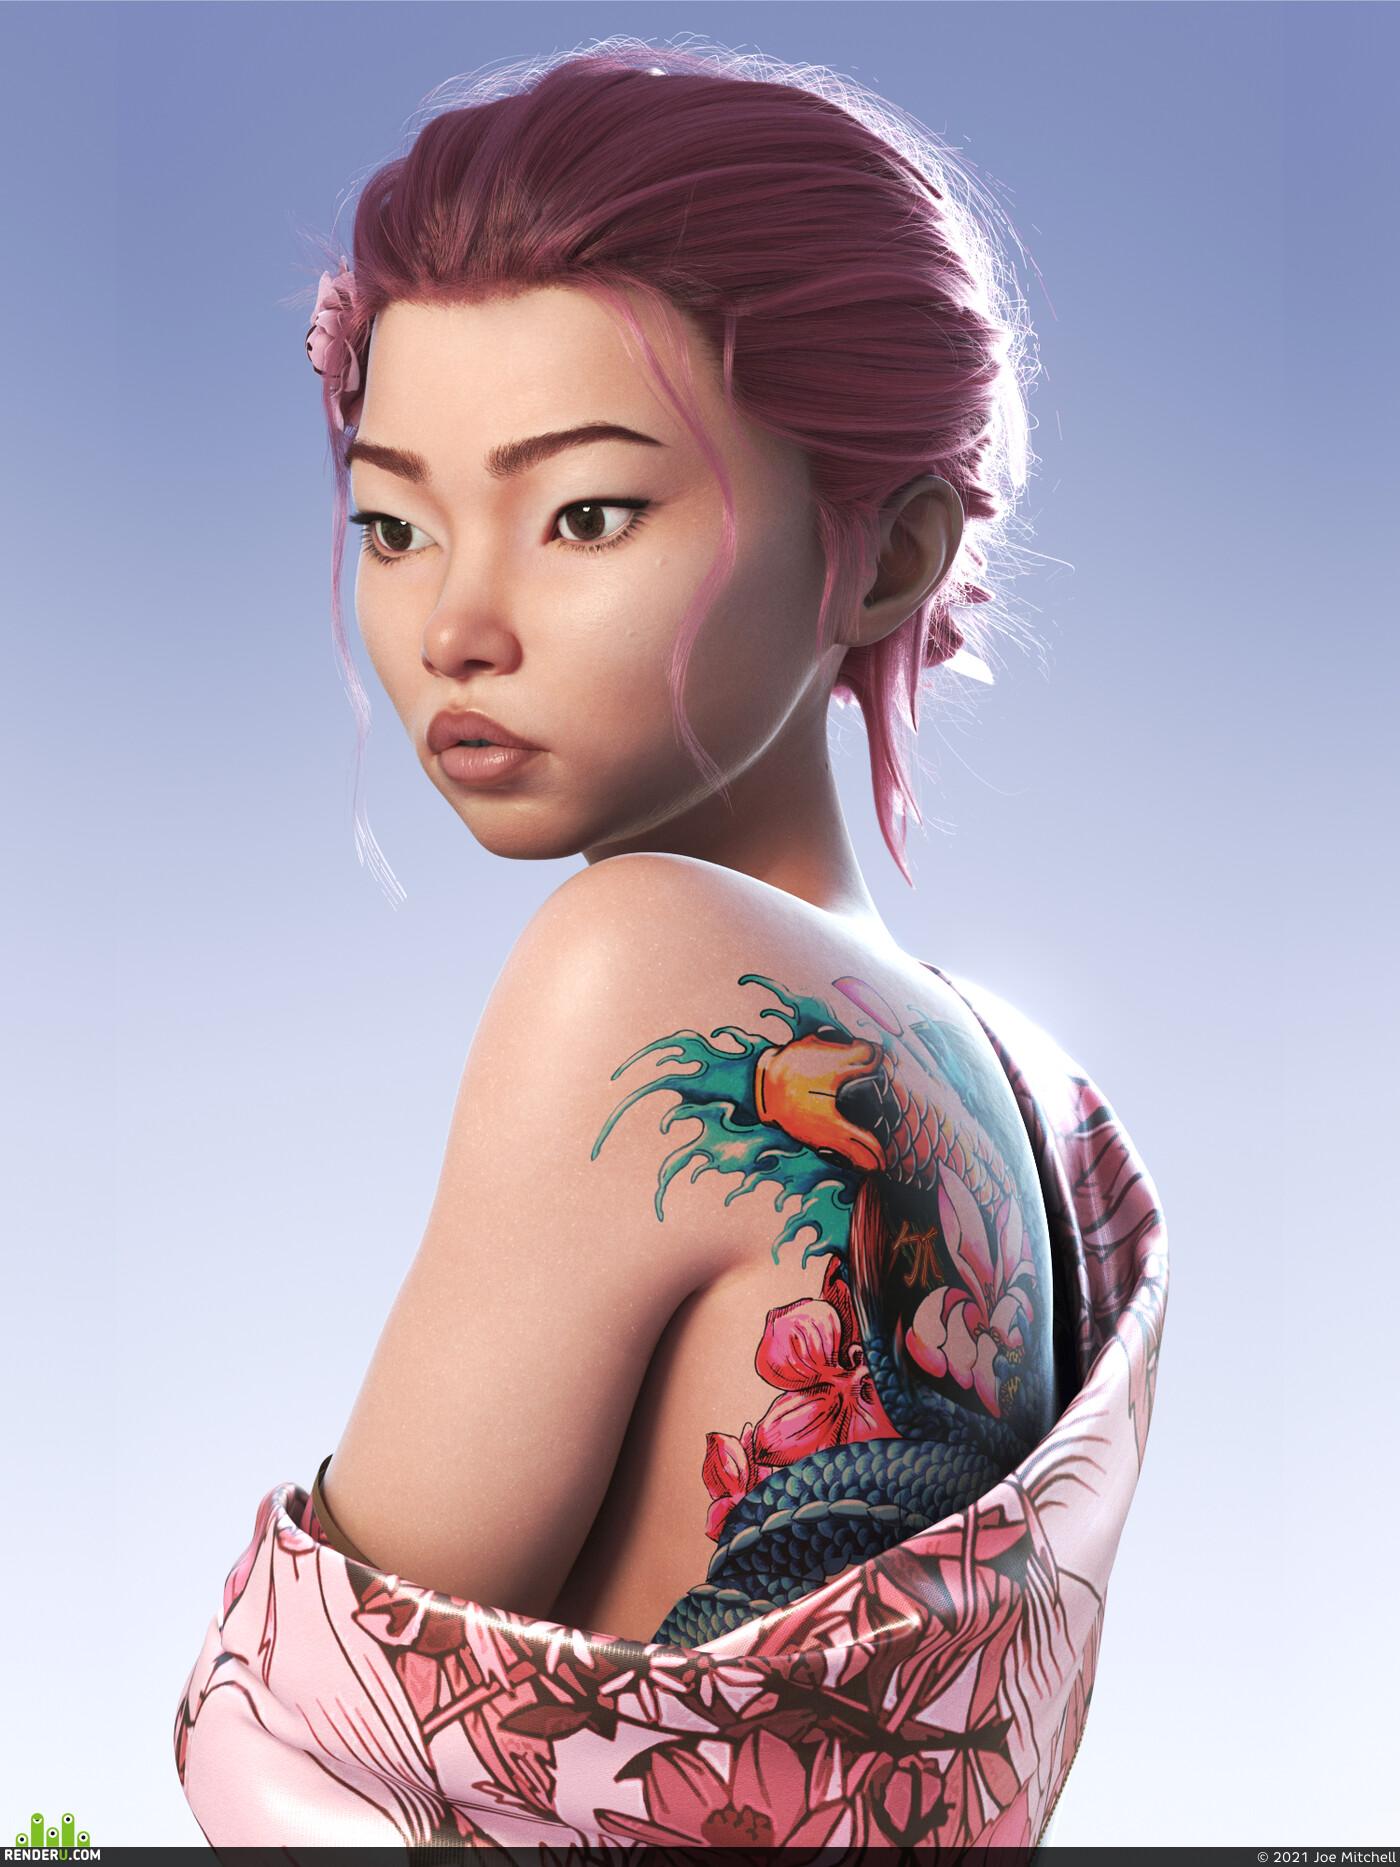 Asian Girl, asian, girlmechanic, woman, womanportrait, face woman, portait, Japan, Japanese